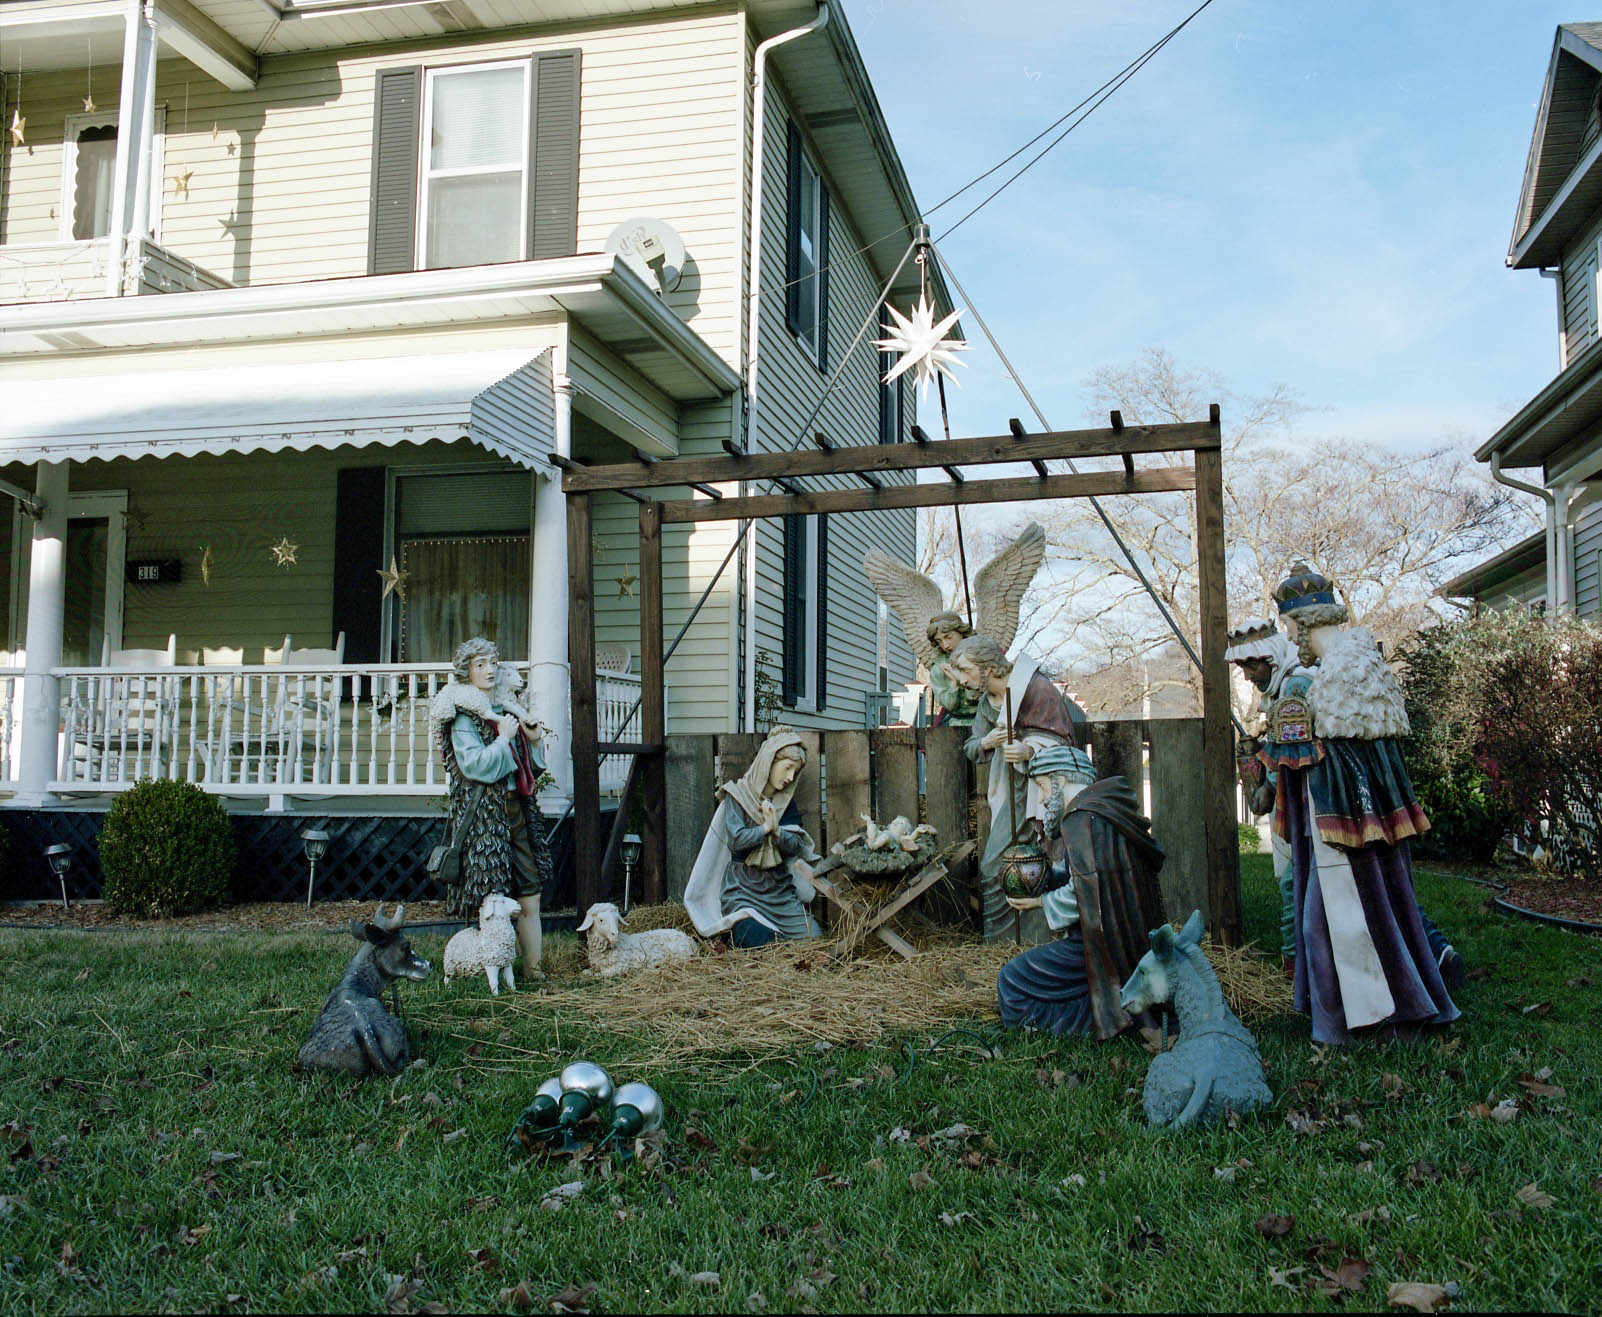 Manger Scene, Erwin, TN. 2013.